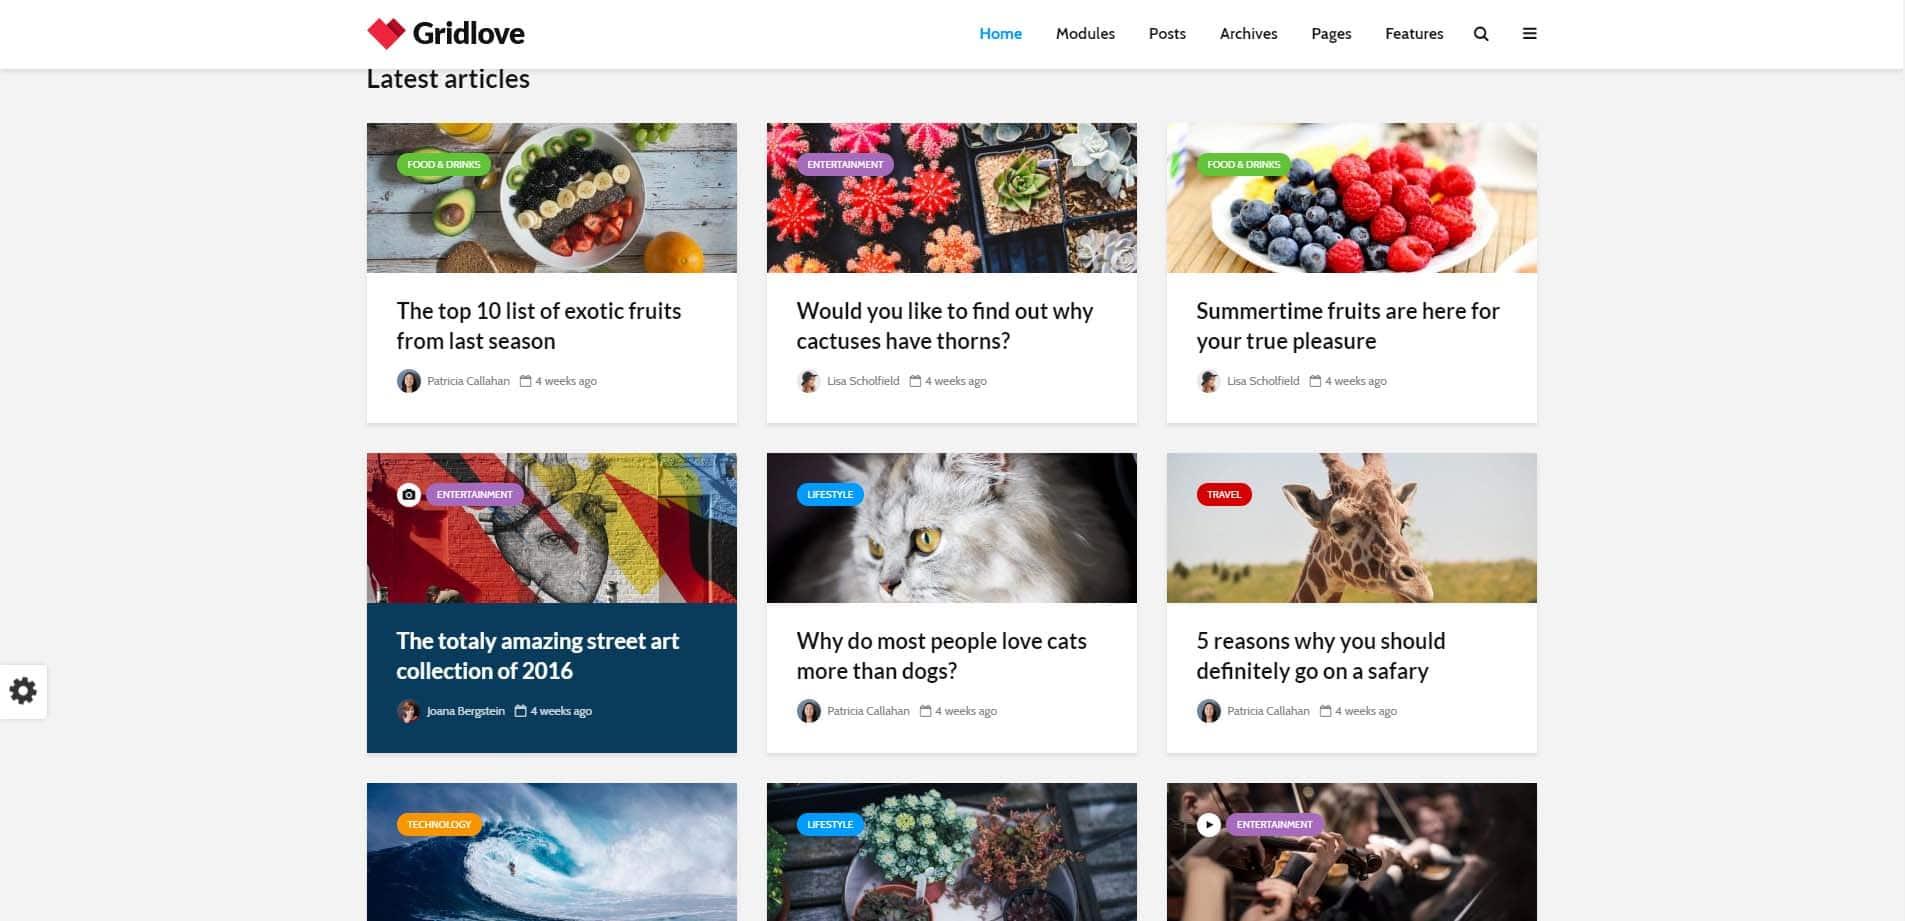 Best Premium WordPress Themes For Travel Blogs